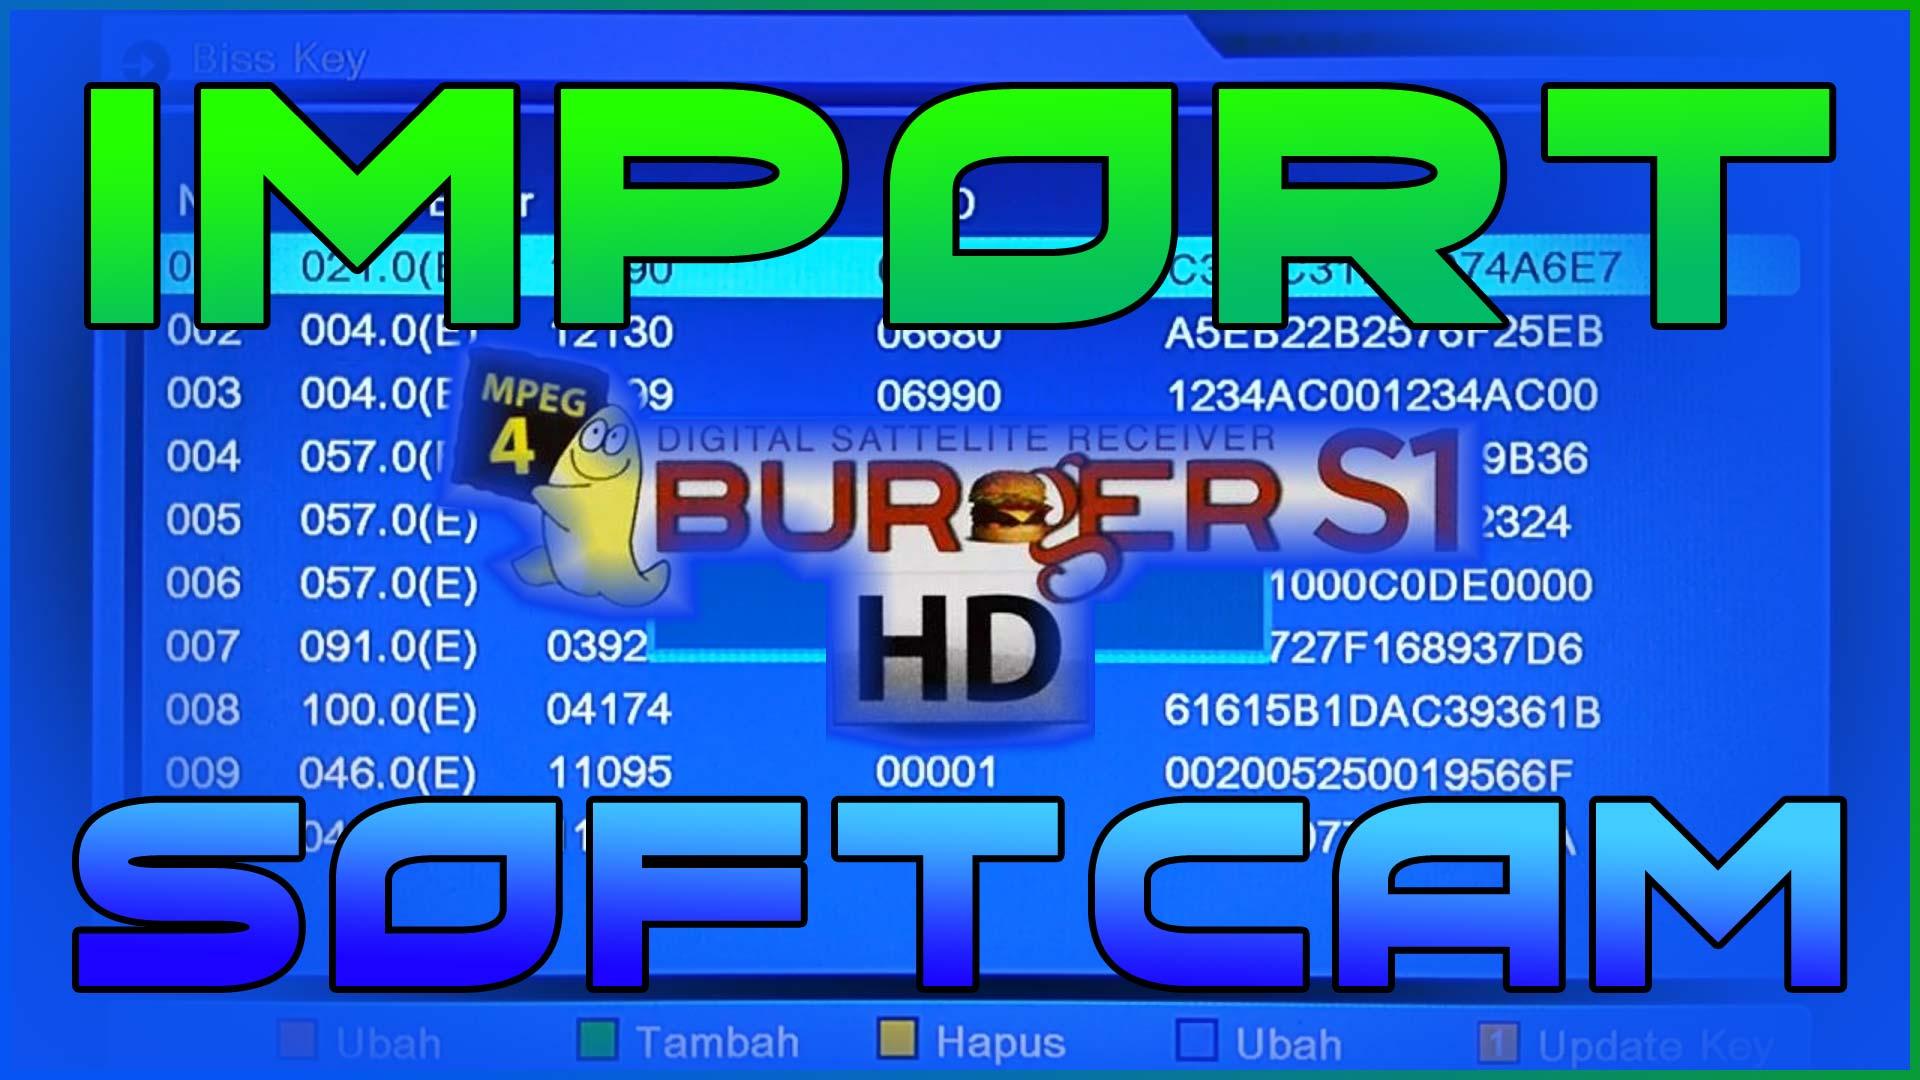 Cara Input Softcam Key Matrix Burger S1 Mini Terbaru